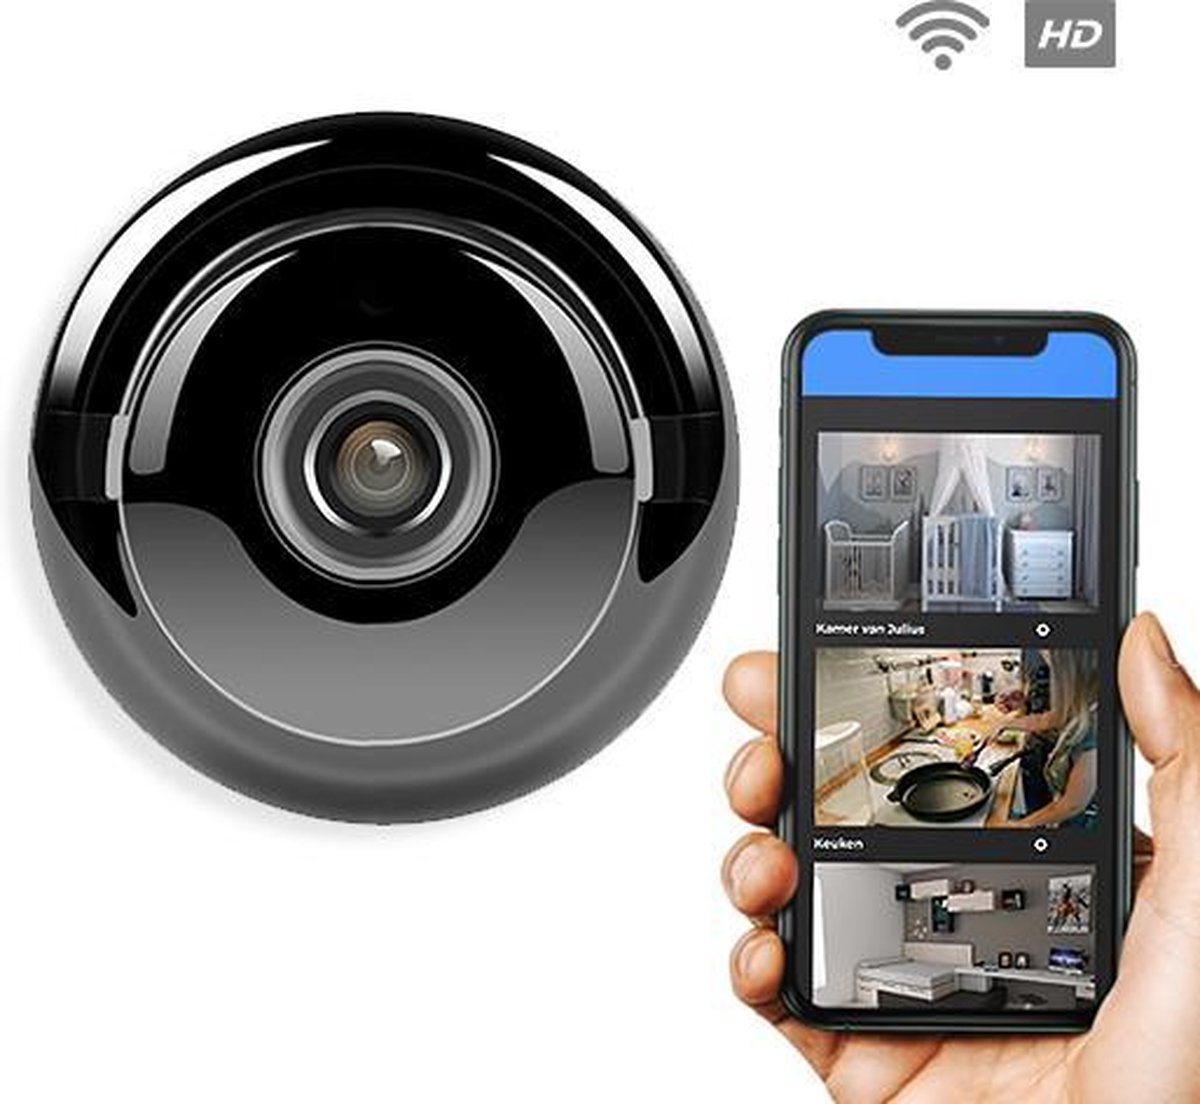 Spy Camera - WiFi - Bewegingsdetectie - Infrarood Nightvision - Beveiligingscamera - Camerabeveiligi